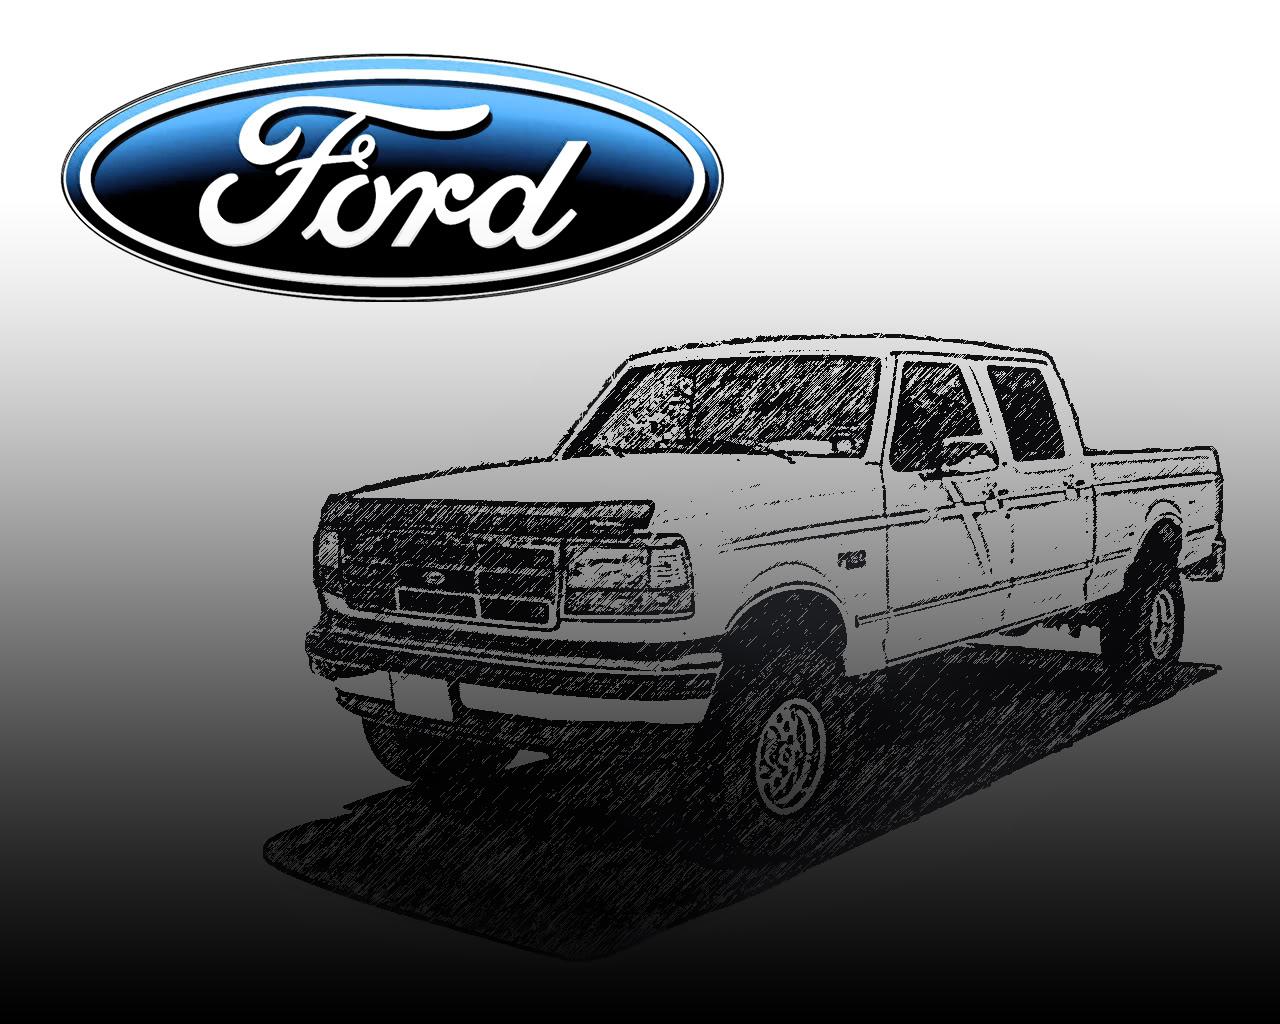 ford trucks wallpaper 52 Ford Trucks Wallpaper 1280x1024